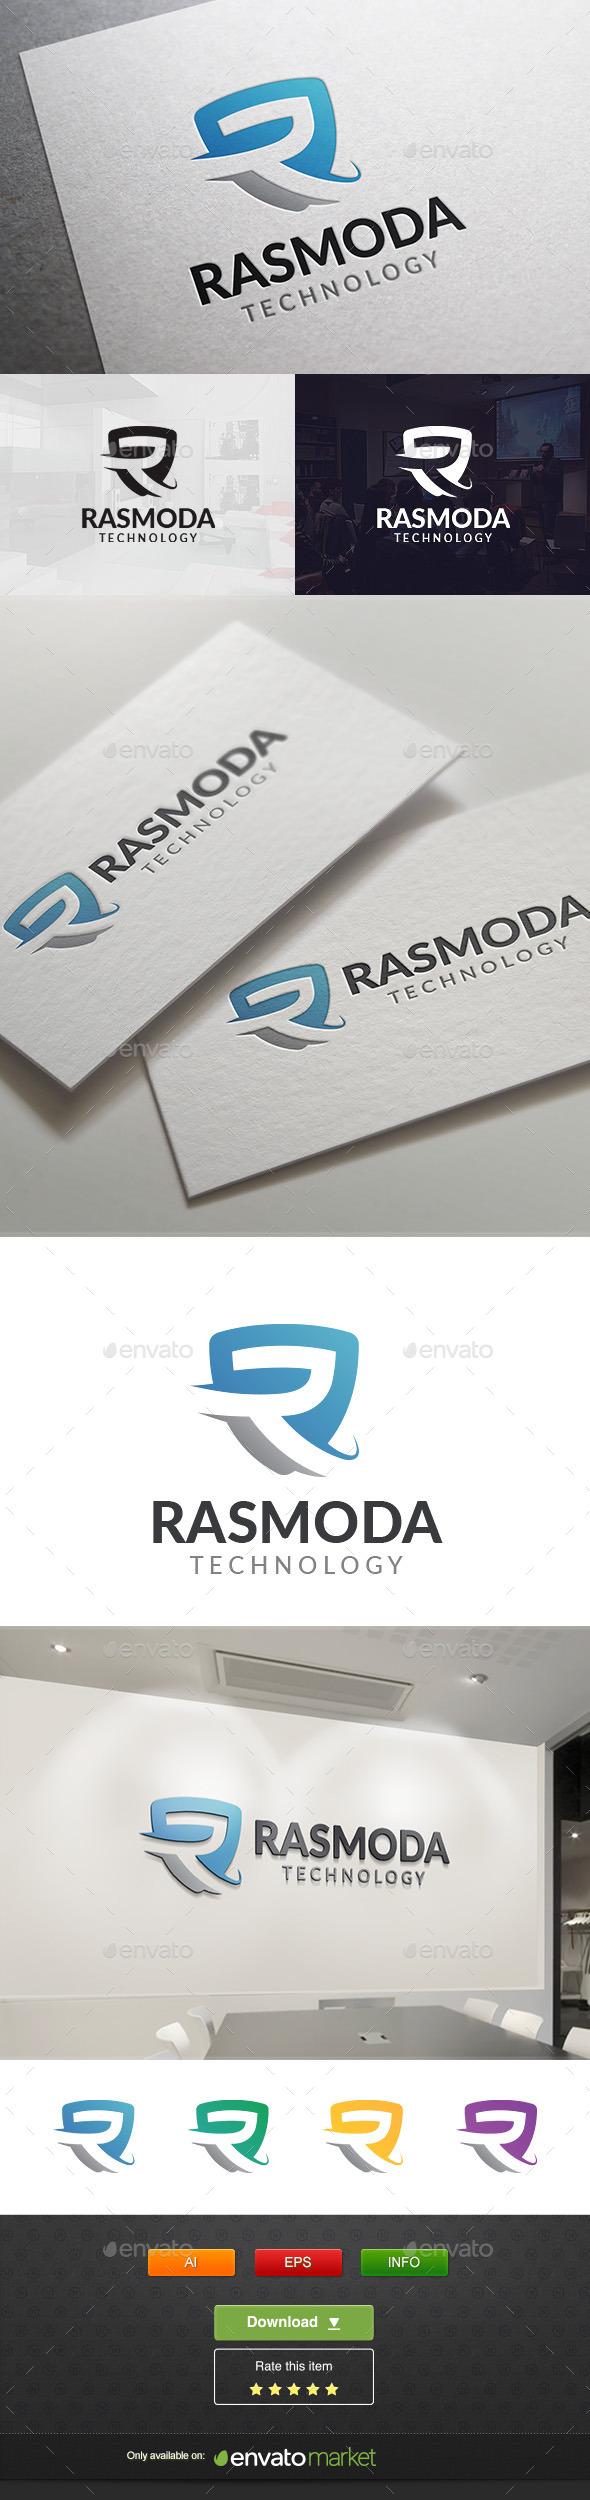 GraphicRiver Rasmoda 11764840